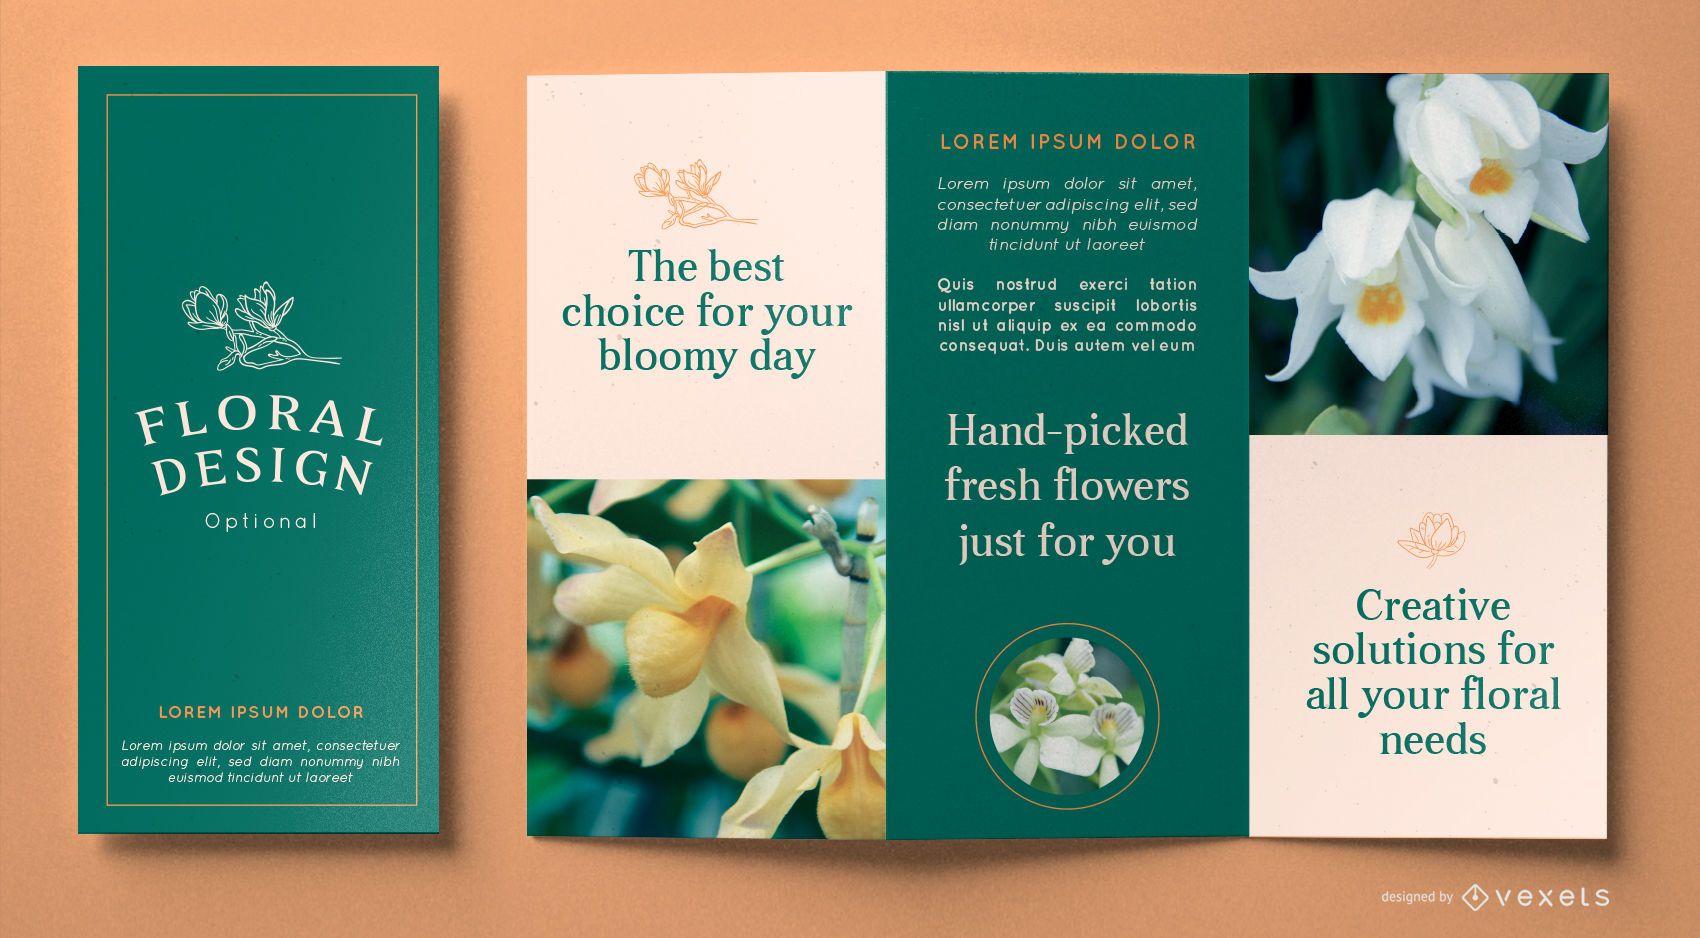 Floral design brochure template